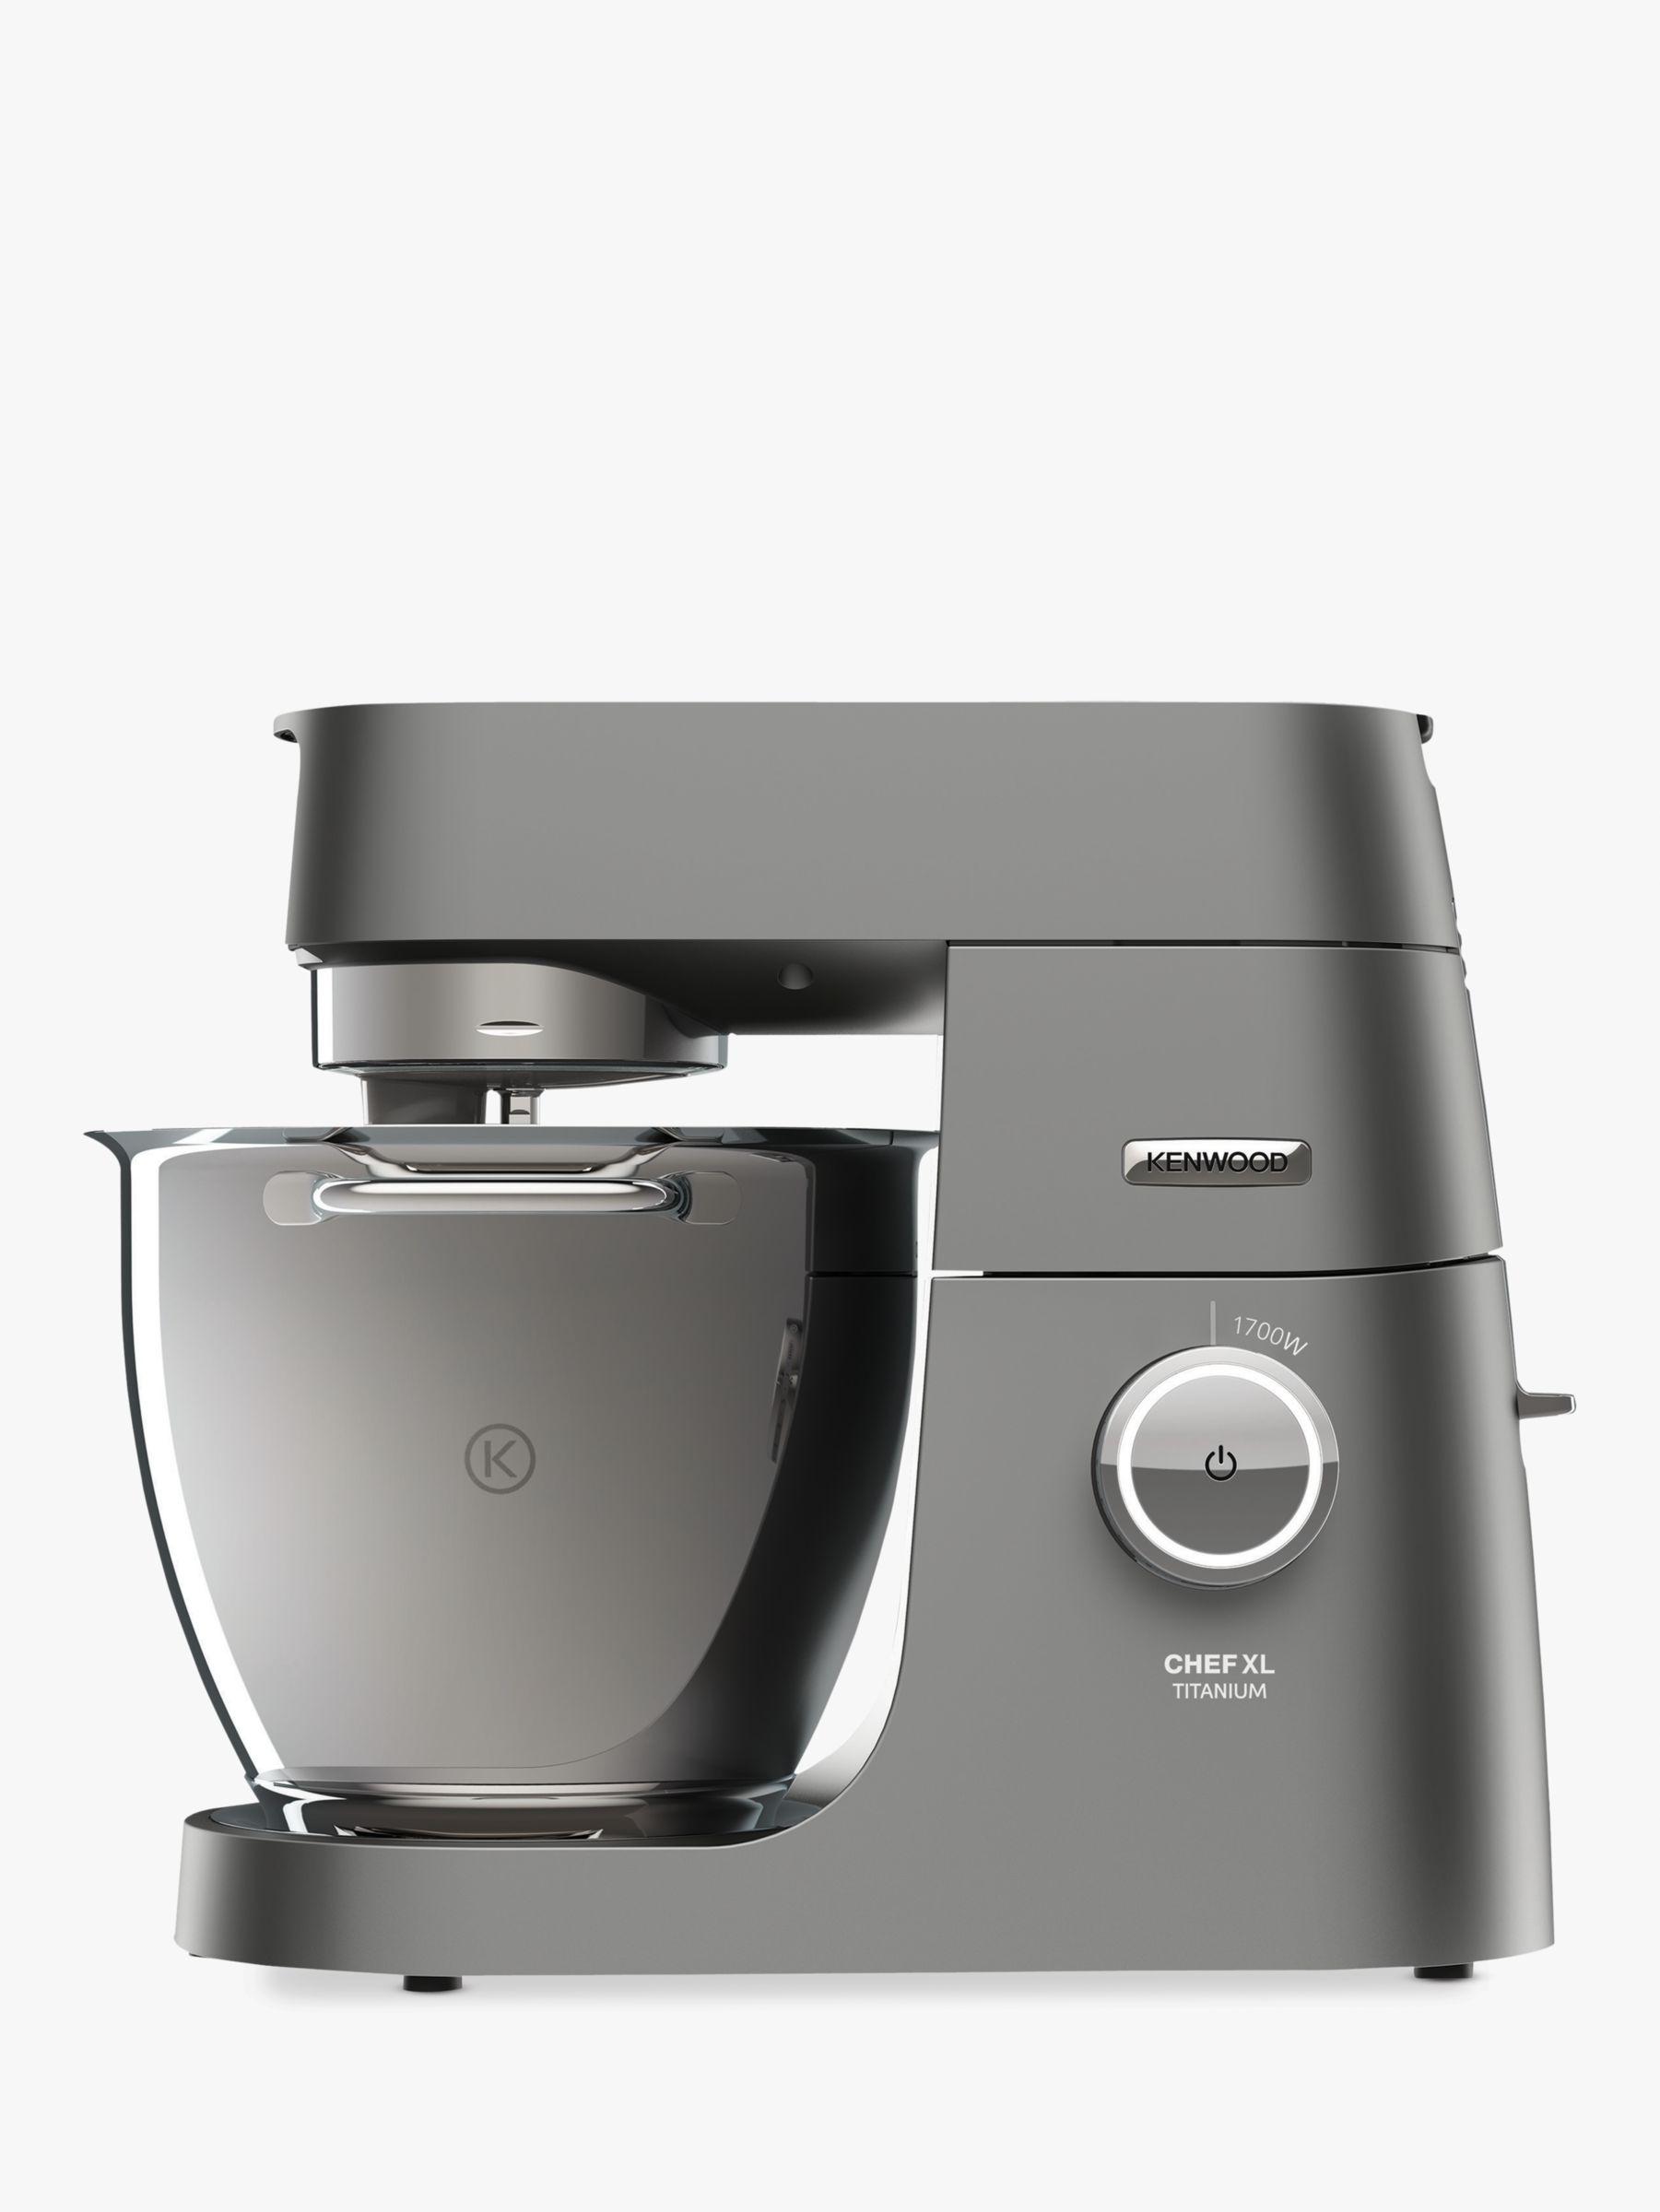 Kenwood Kenwood KVL8300S Chef Titanium XL Stand Mixer, Silver